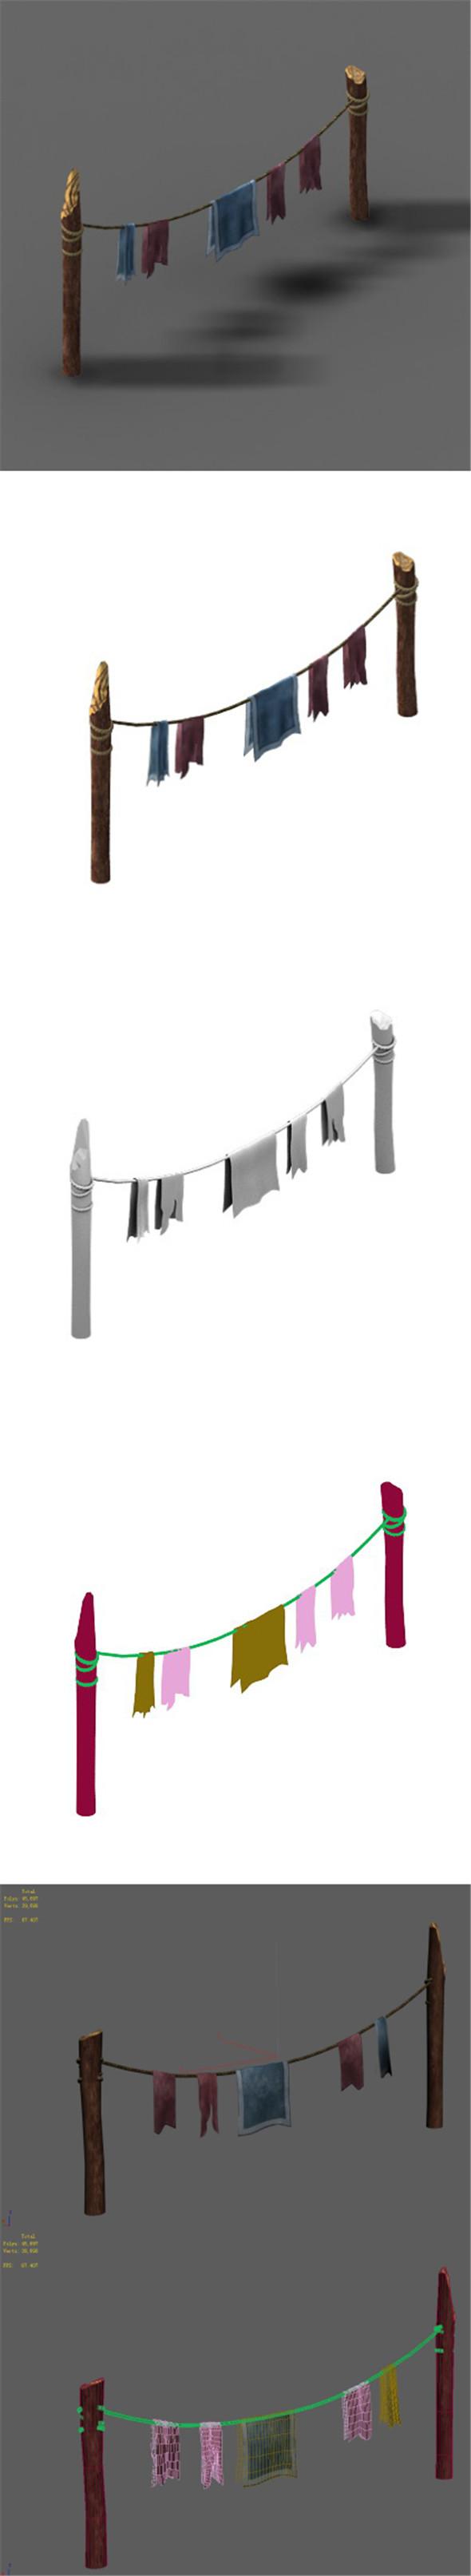 Railings 15 - 3DOcean Item for Sale